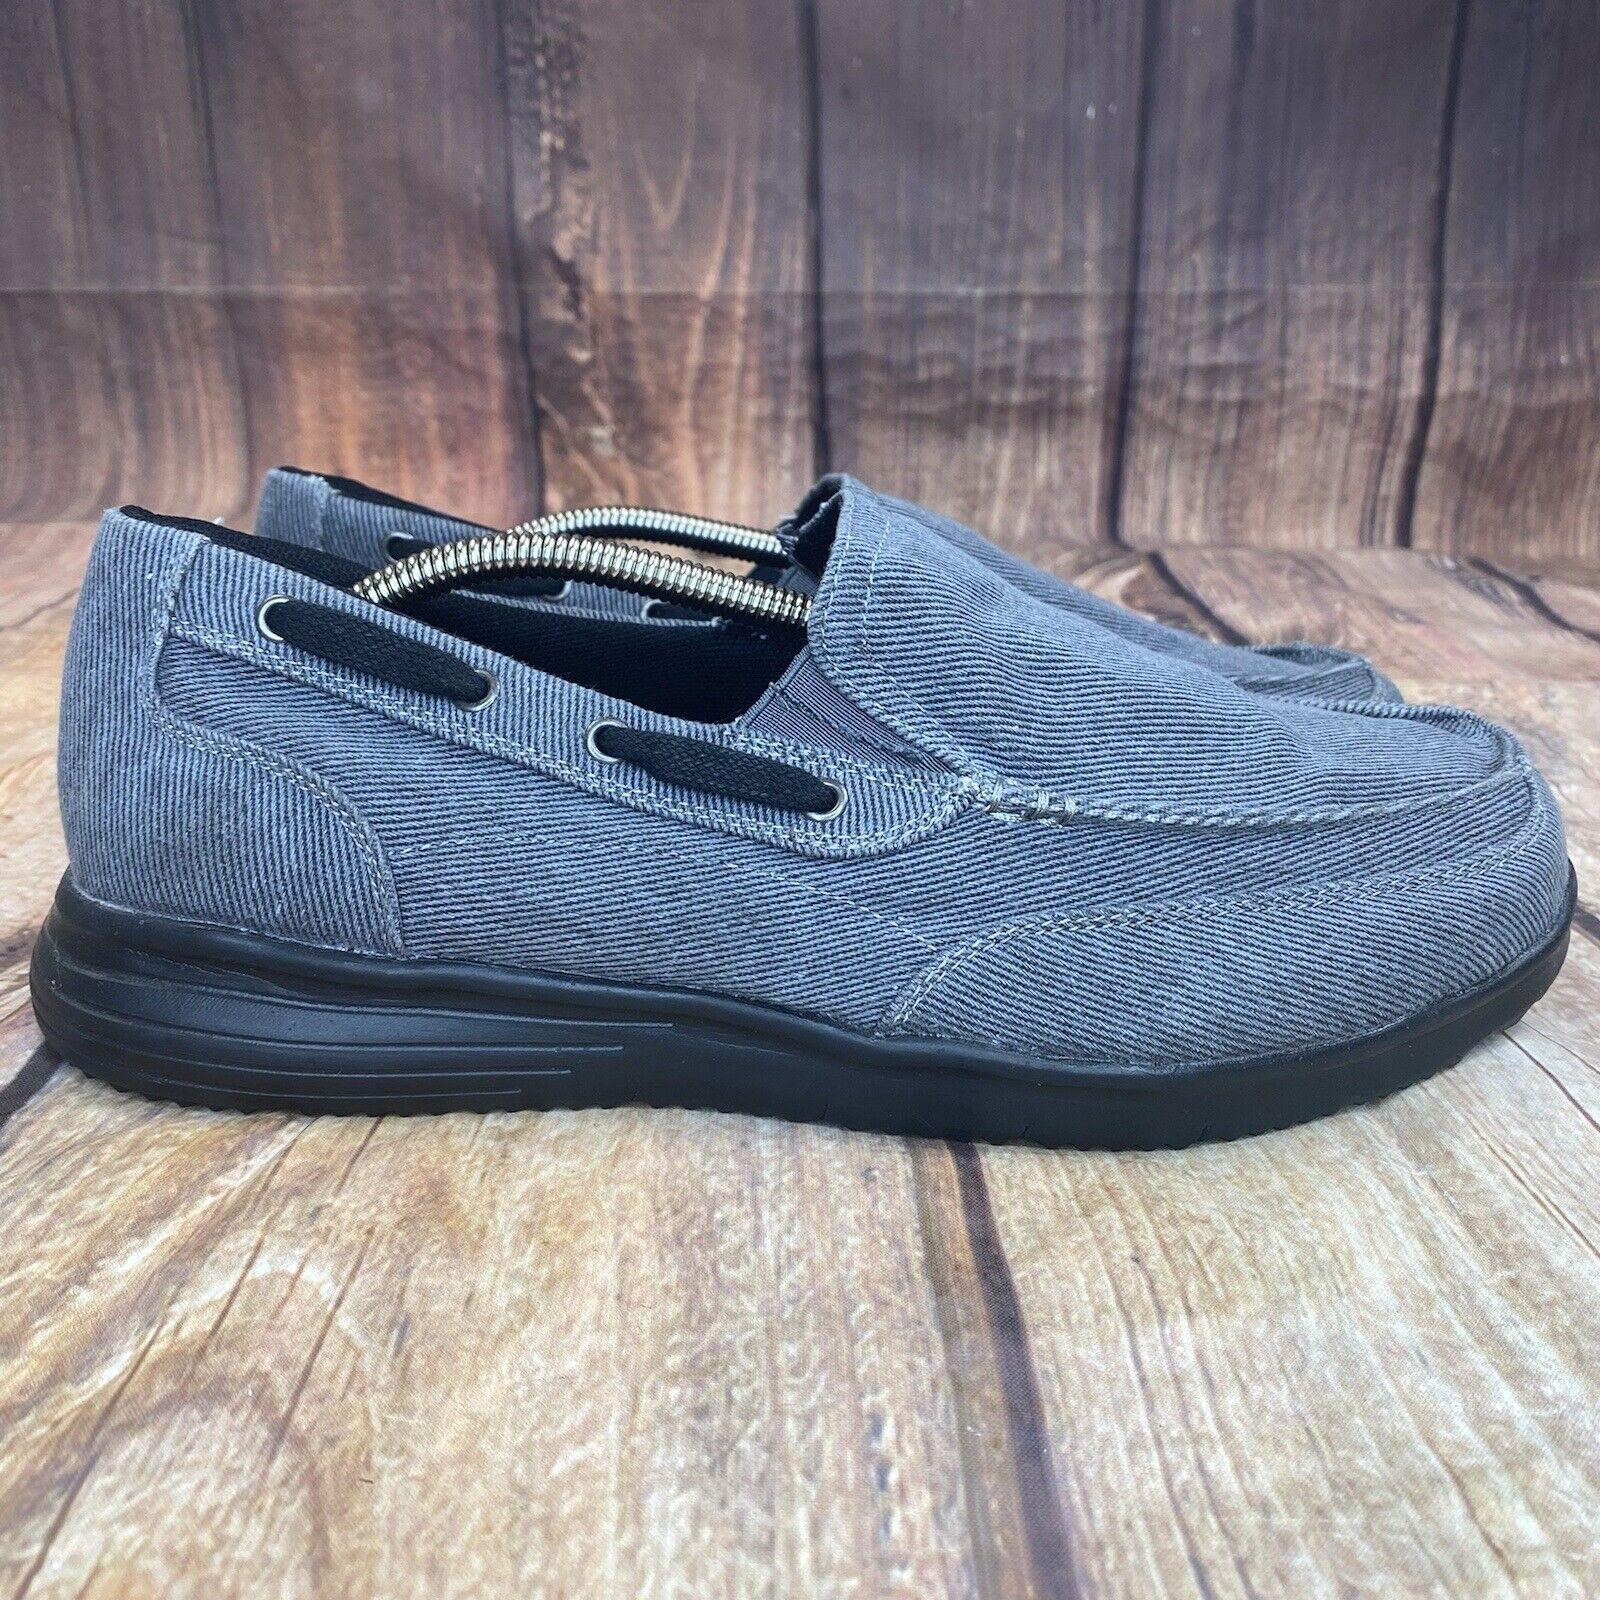 Propet Swayer Canvas Boat Shoes Men Size 9.5 5E Slip On Deck Shoes - Gray - New